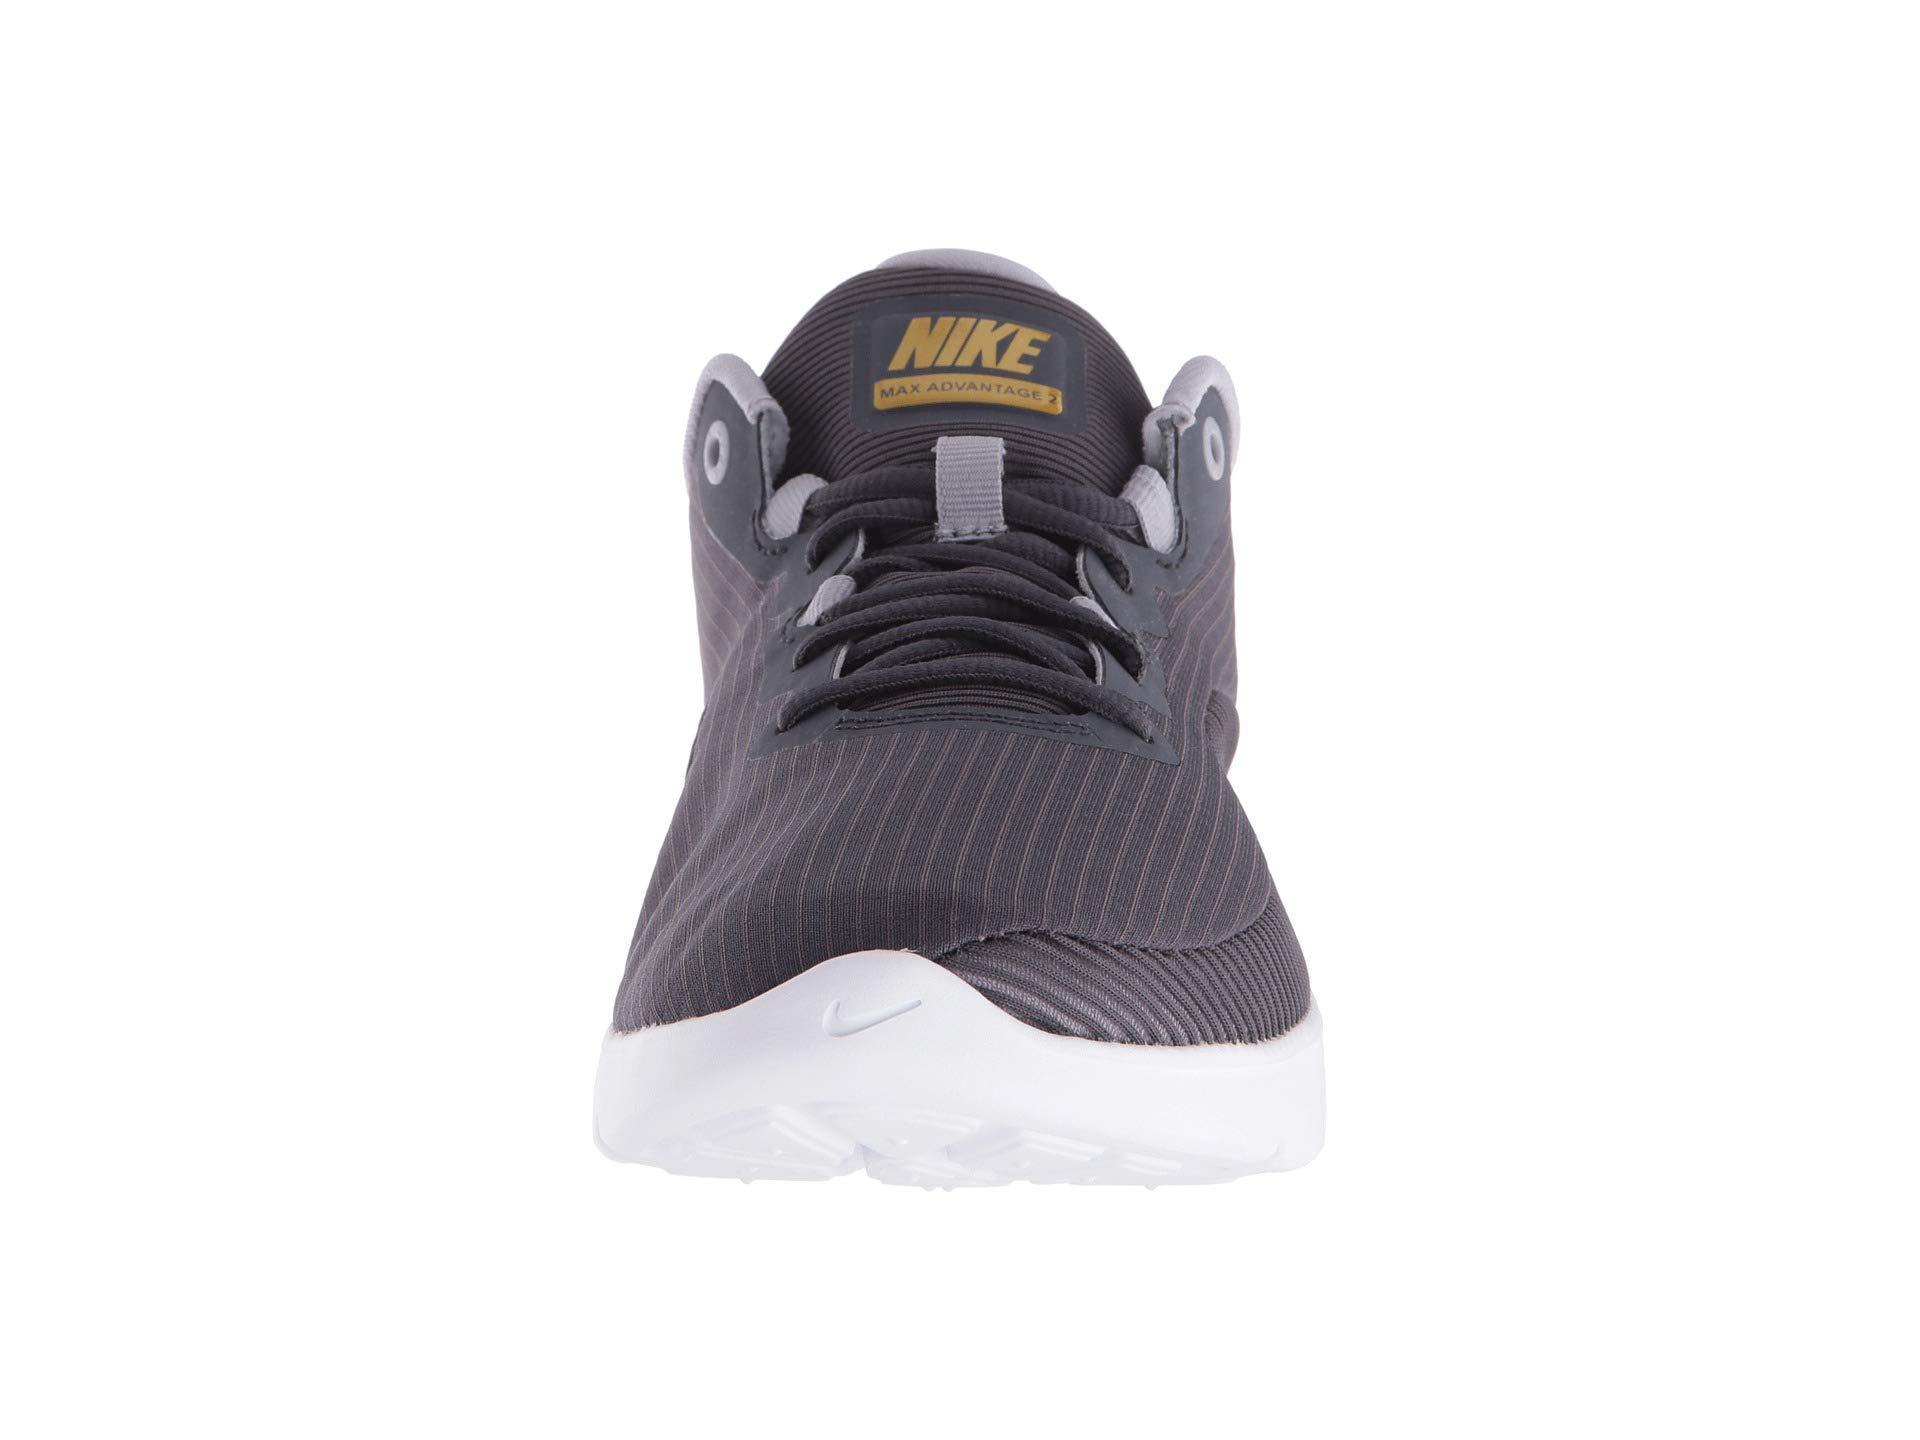 a1137c91f66 Nike - Multicolor Air Max Advantage 2 (gridiron metallic Pewter provence  Purple). View fullscreen